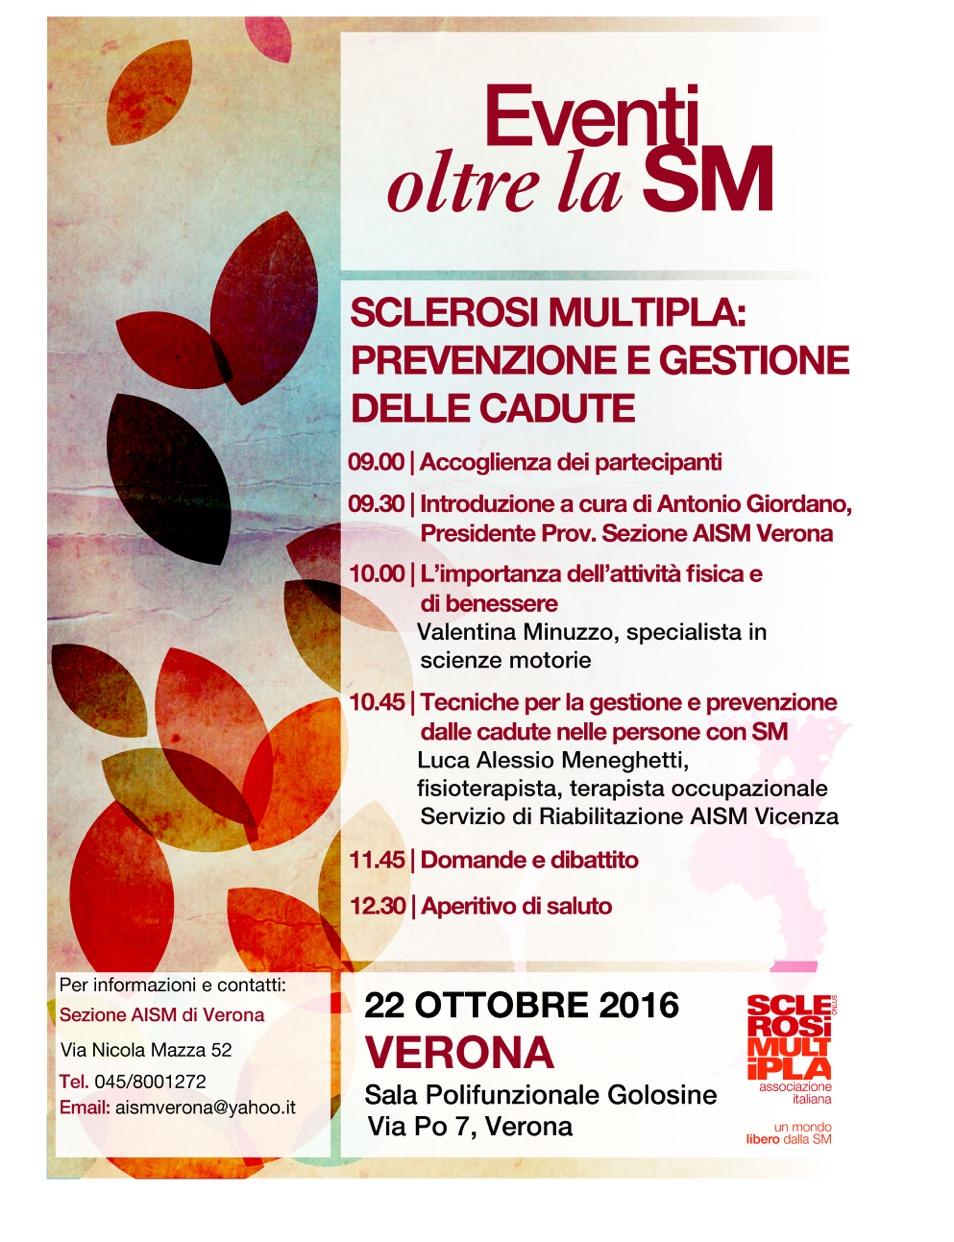 Convegno oltre la SM, 22 ottobre, Verona